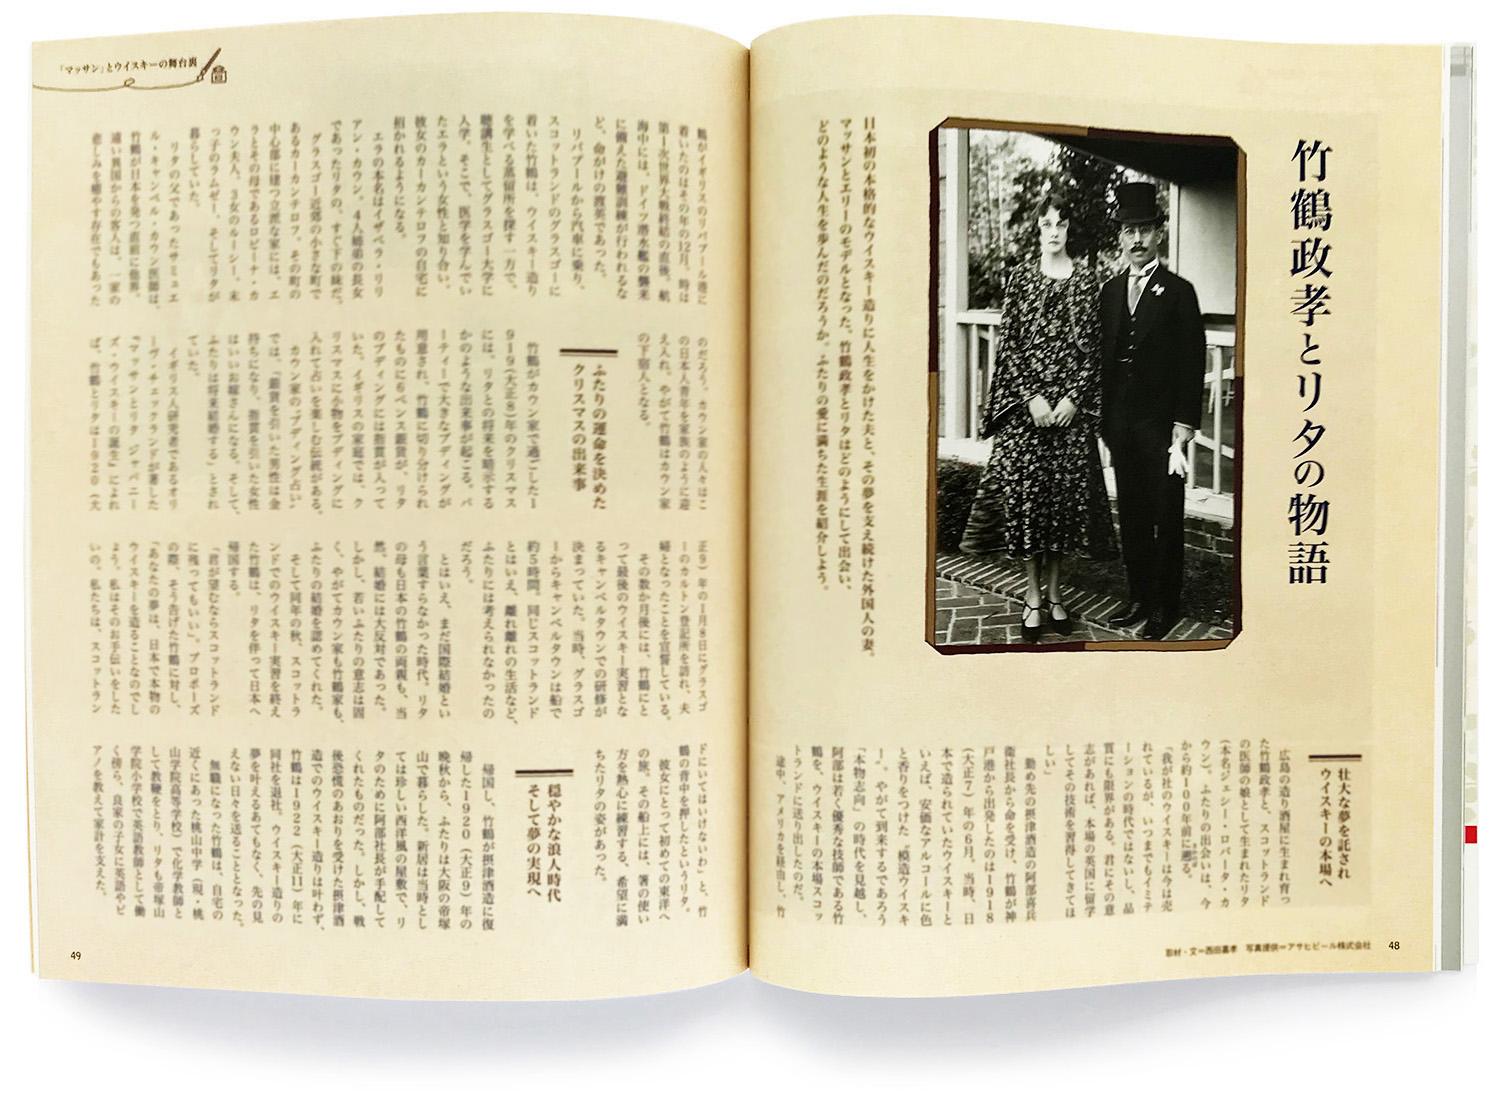 NHKドラマ・ガイド『連続テレビ小説 マッサン』 2